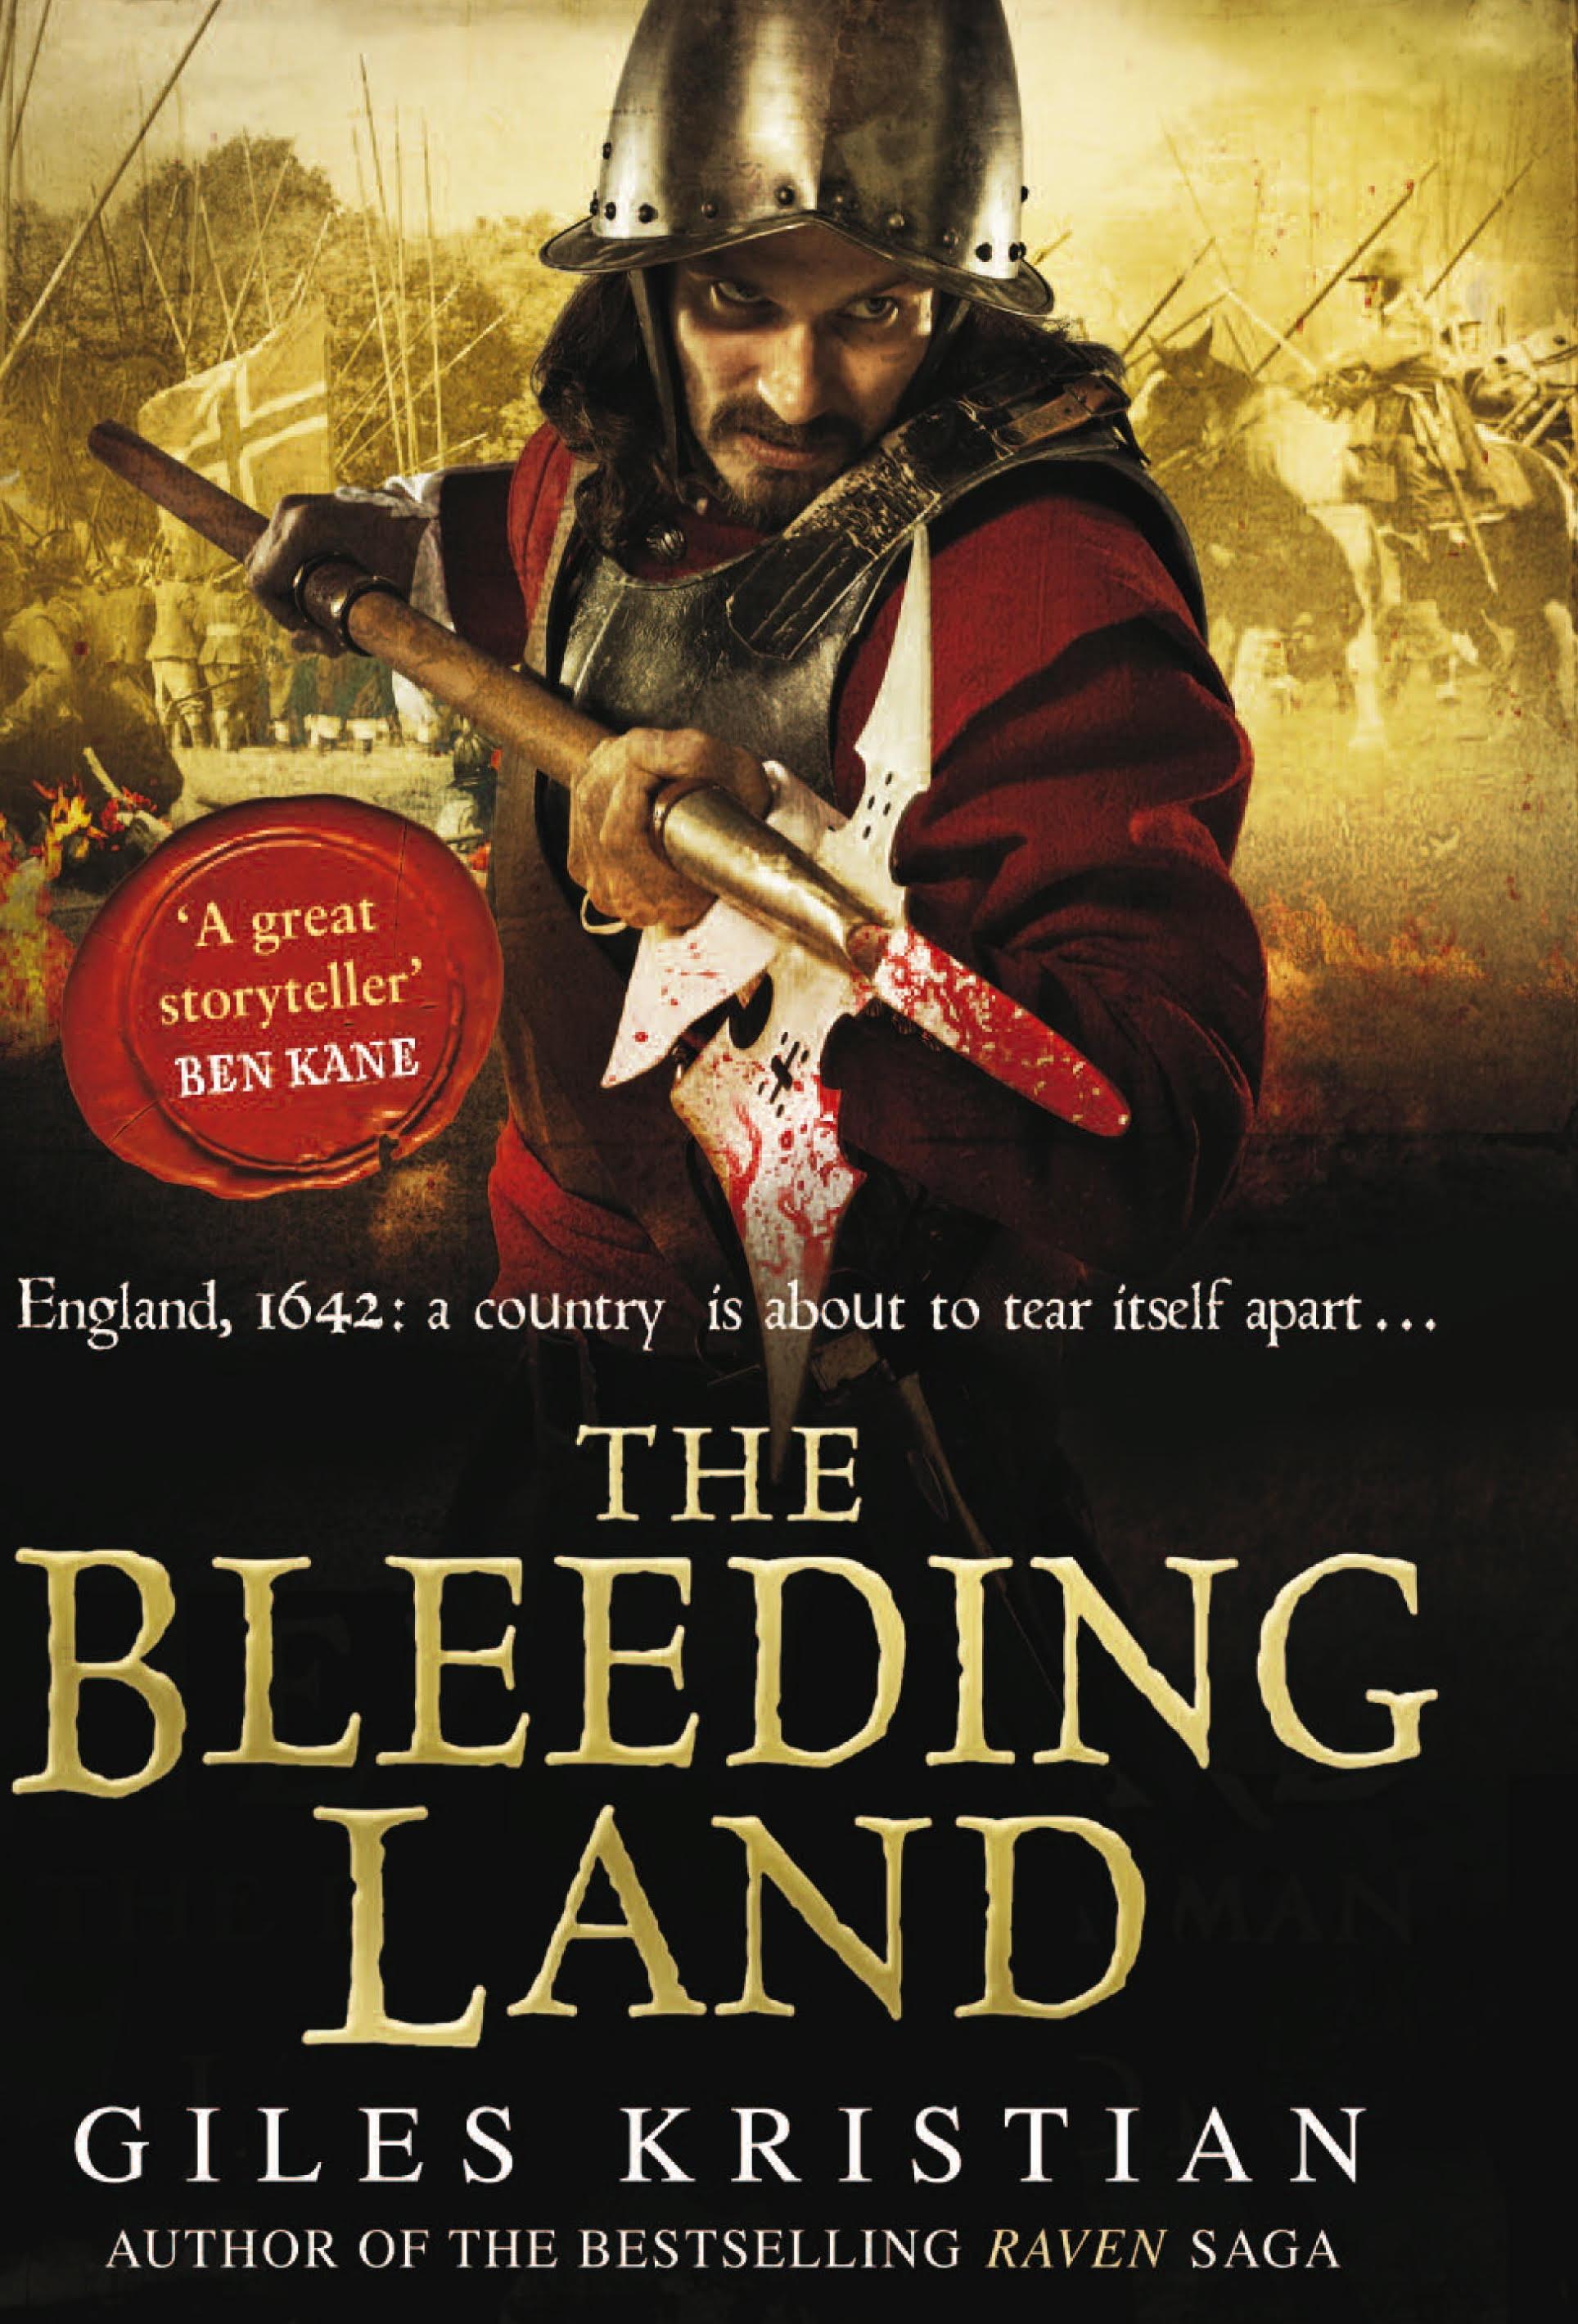 The Bleeding Land by Giles Kristian